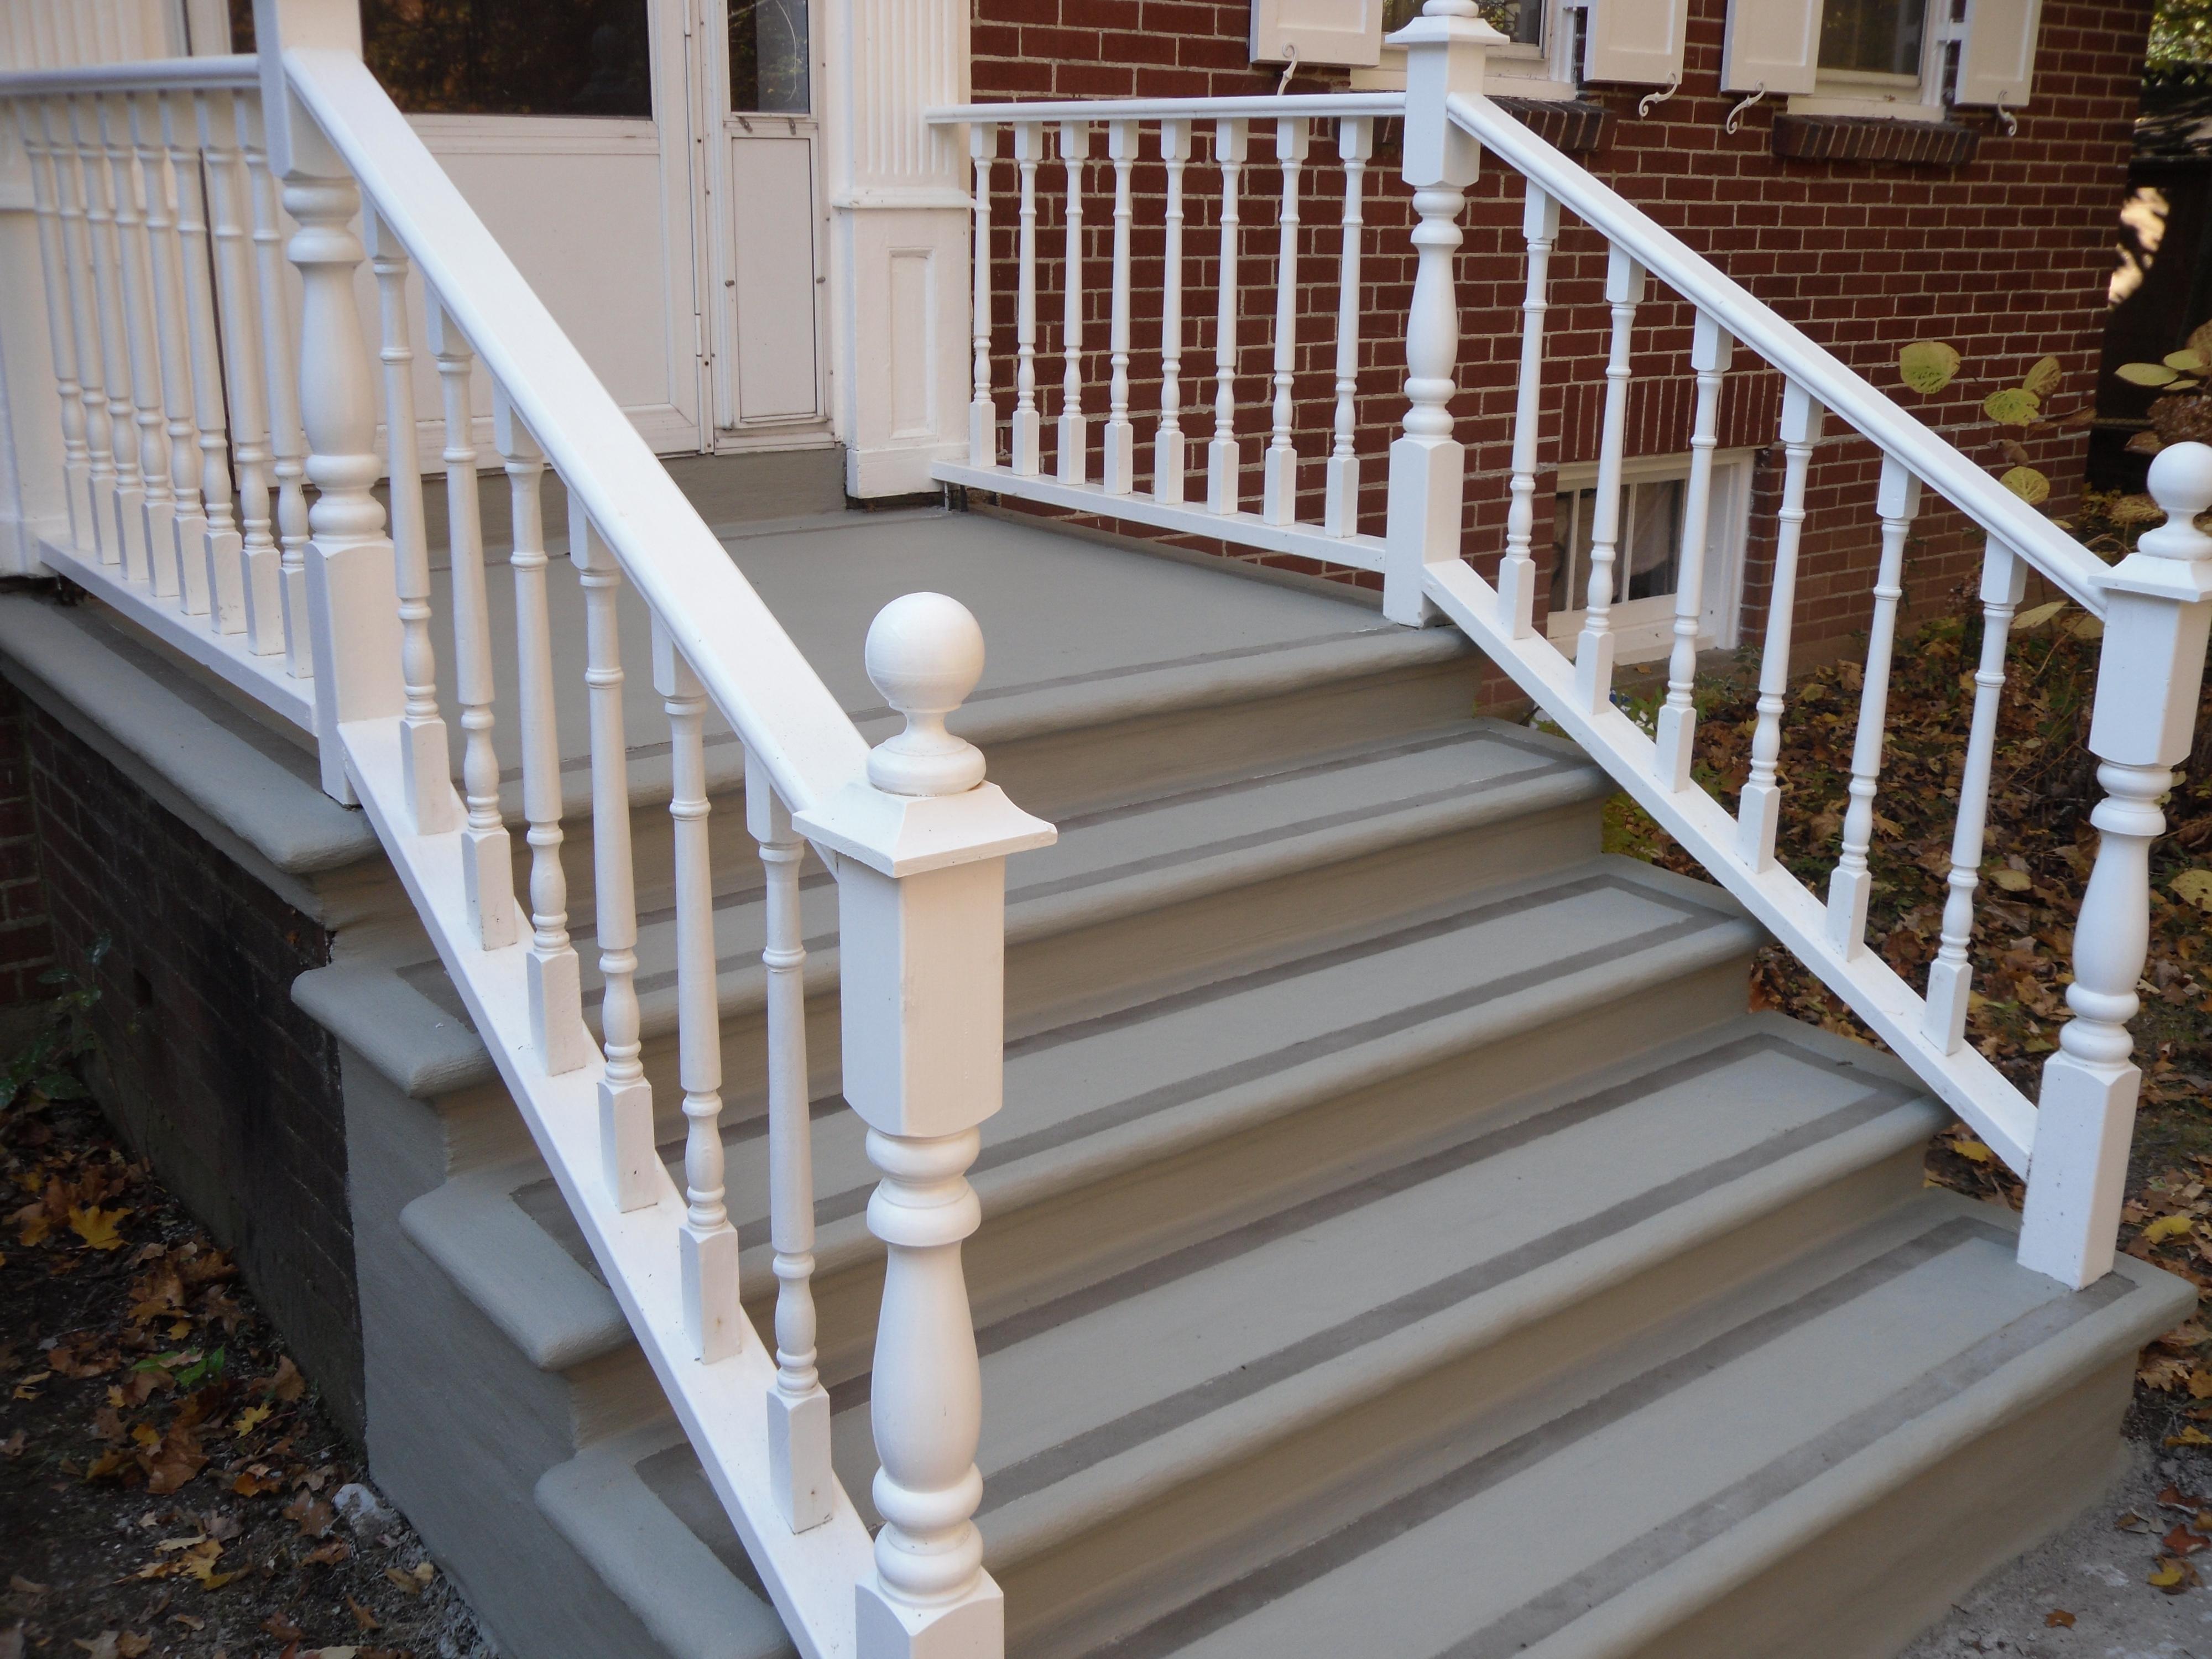 Stair resurfacing with borders tybo concrete coatings - Resurfacing exterior concrete stairs ...